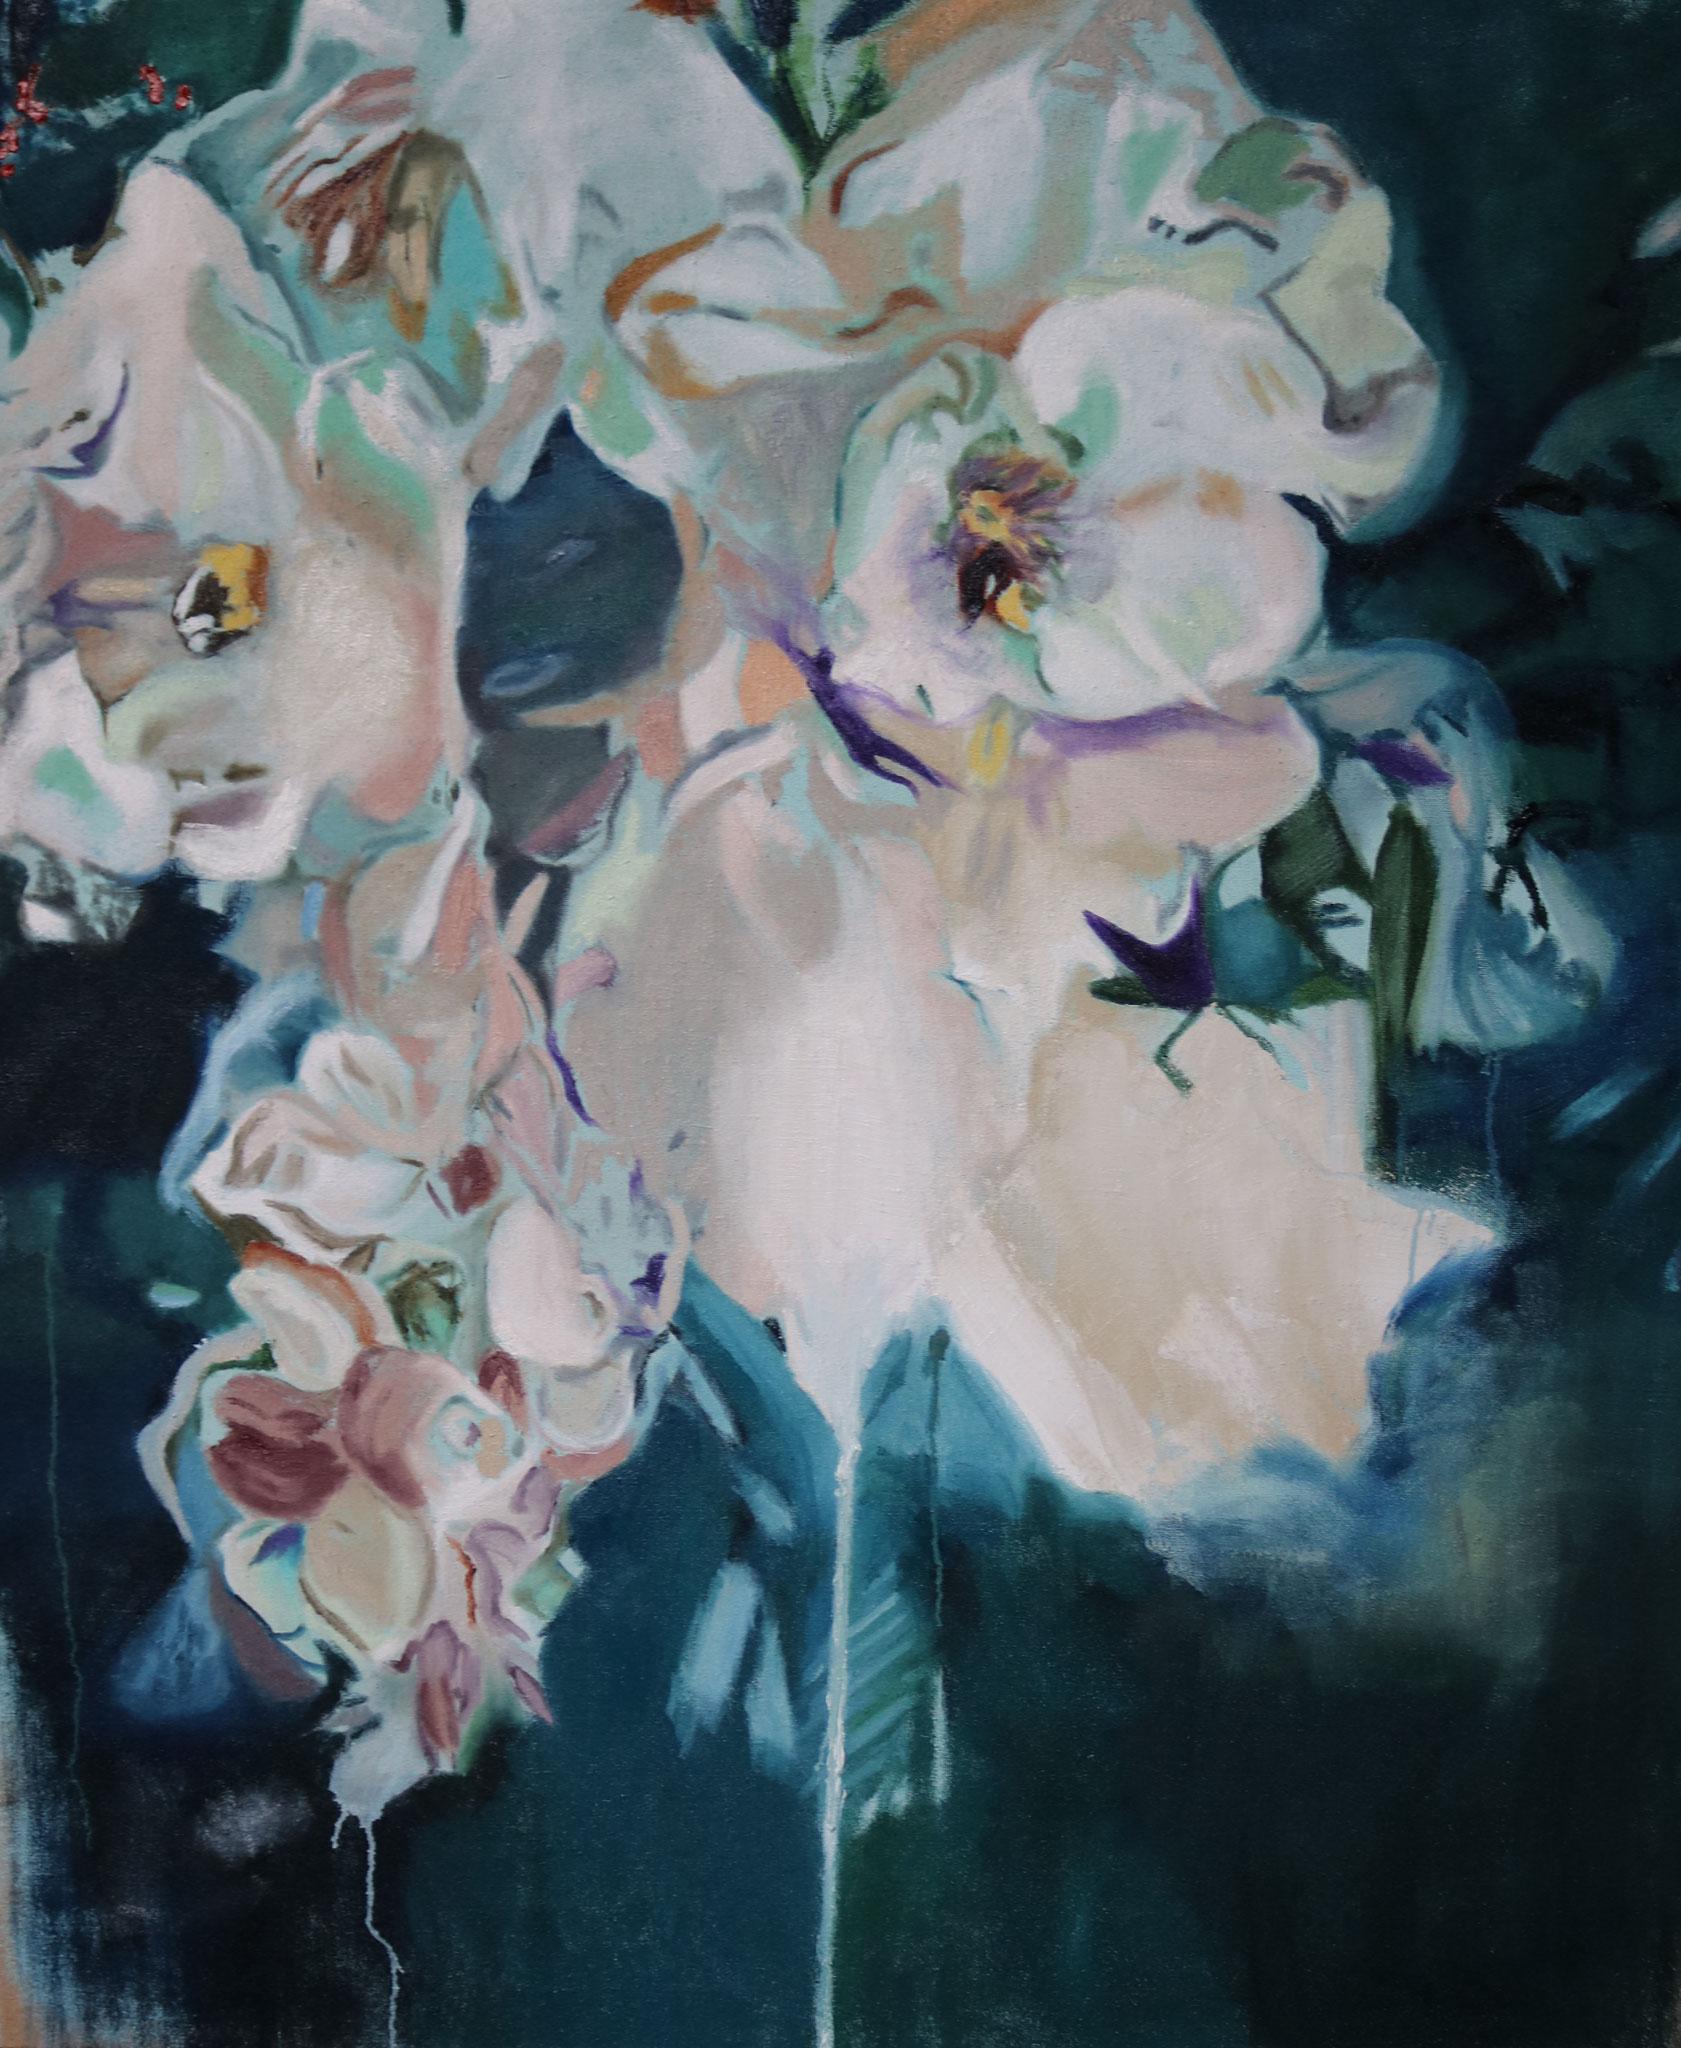 """Blumen I"" 145 x 180cm - Öl auf Leinwand 2017"